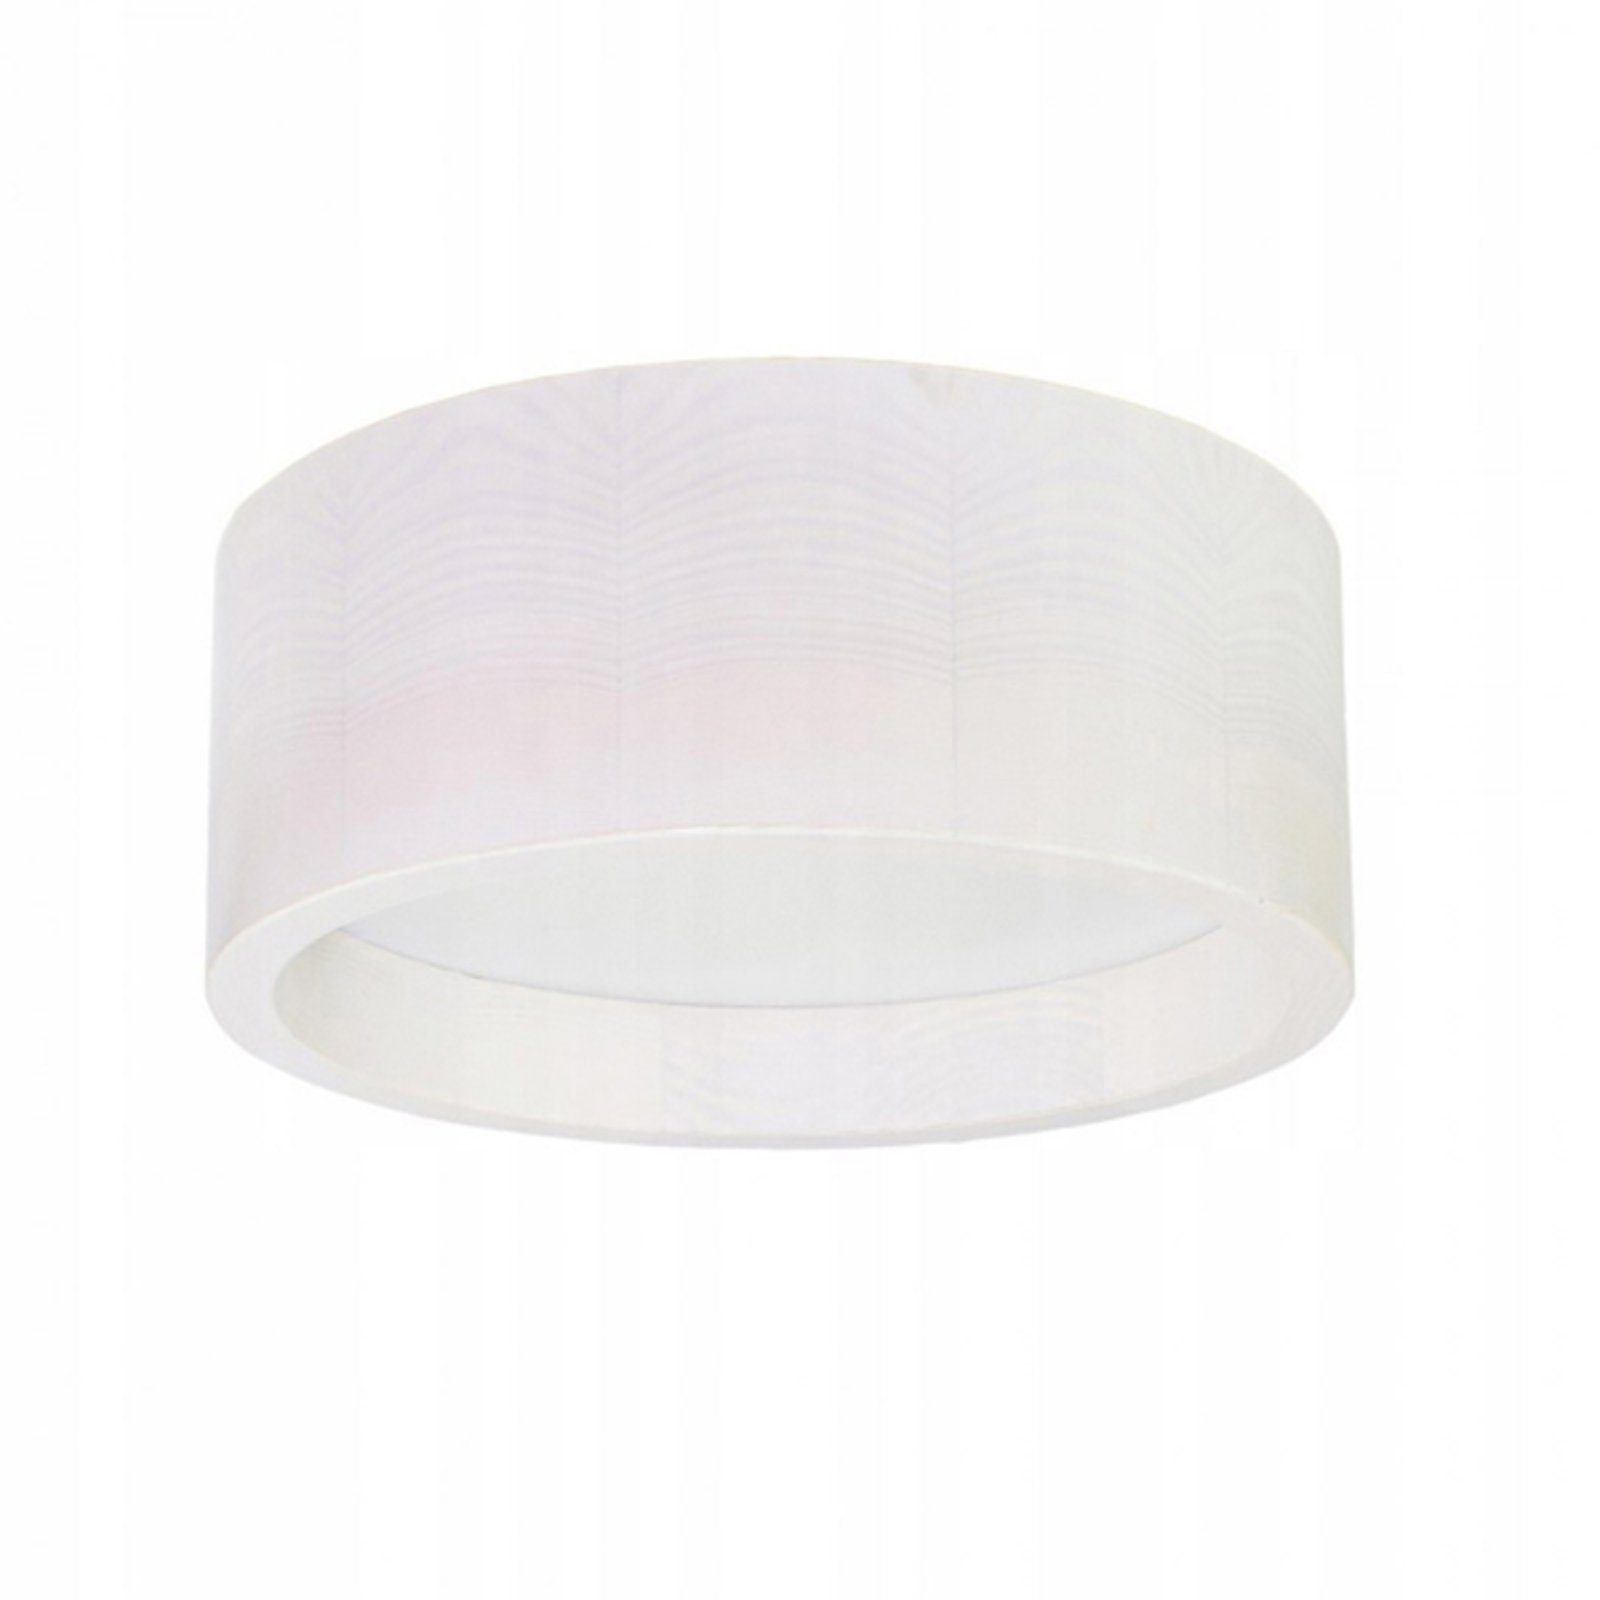 LED-taklampe Deep, Ø 28 cm, hvit